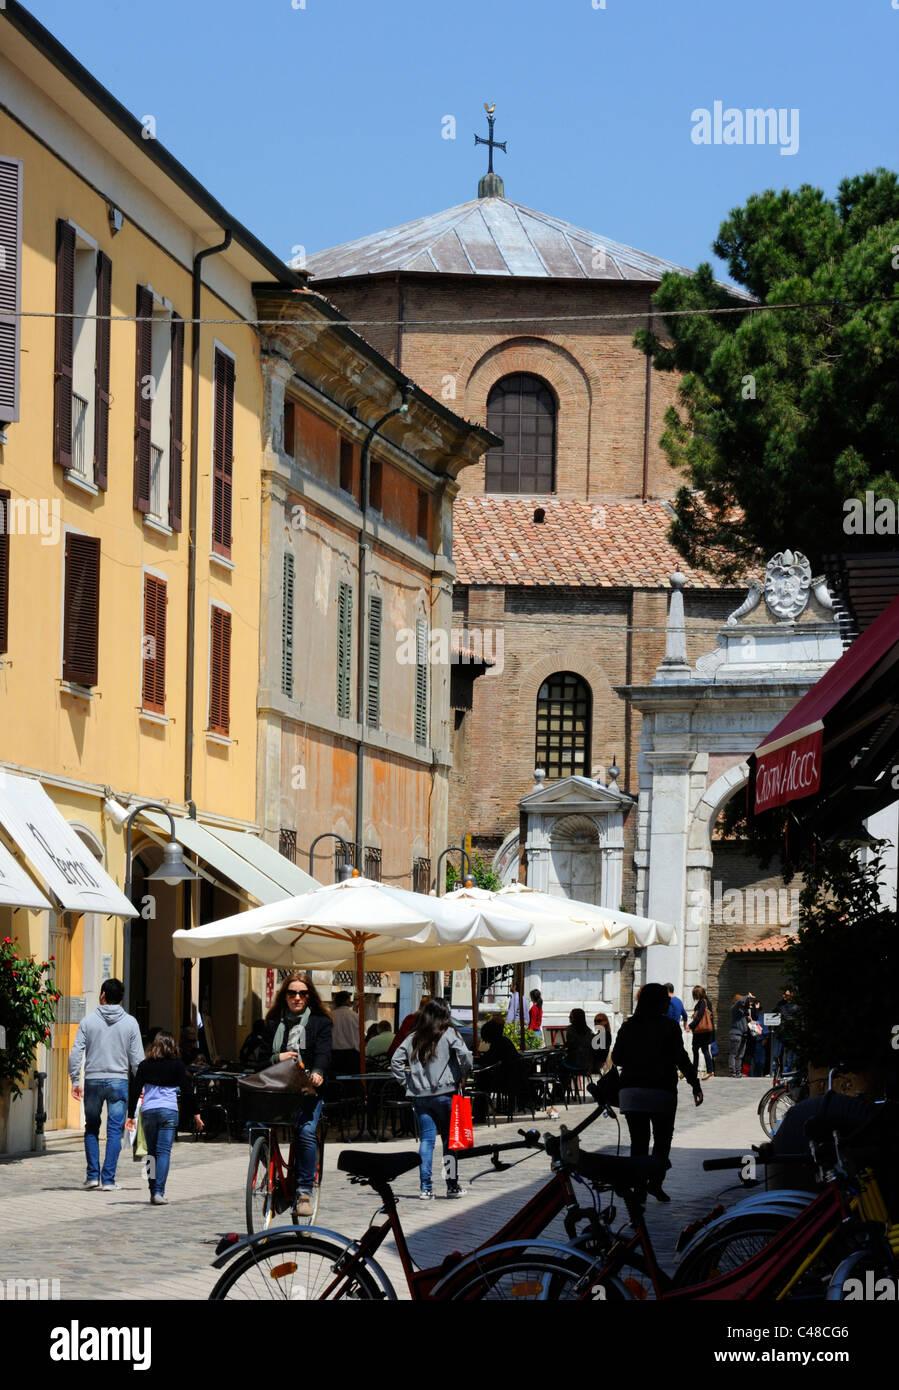 Via Argentario and the Basilica of San Vitale in Ravenna - Stock Image